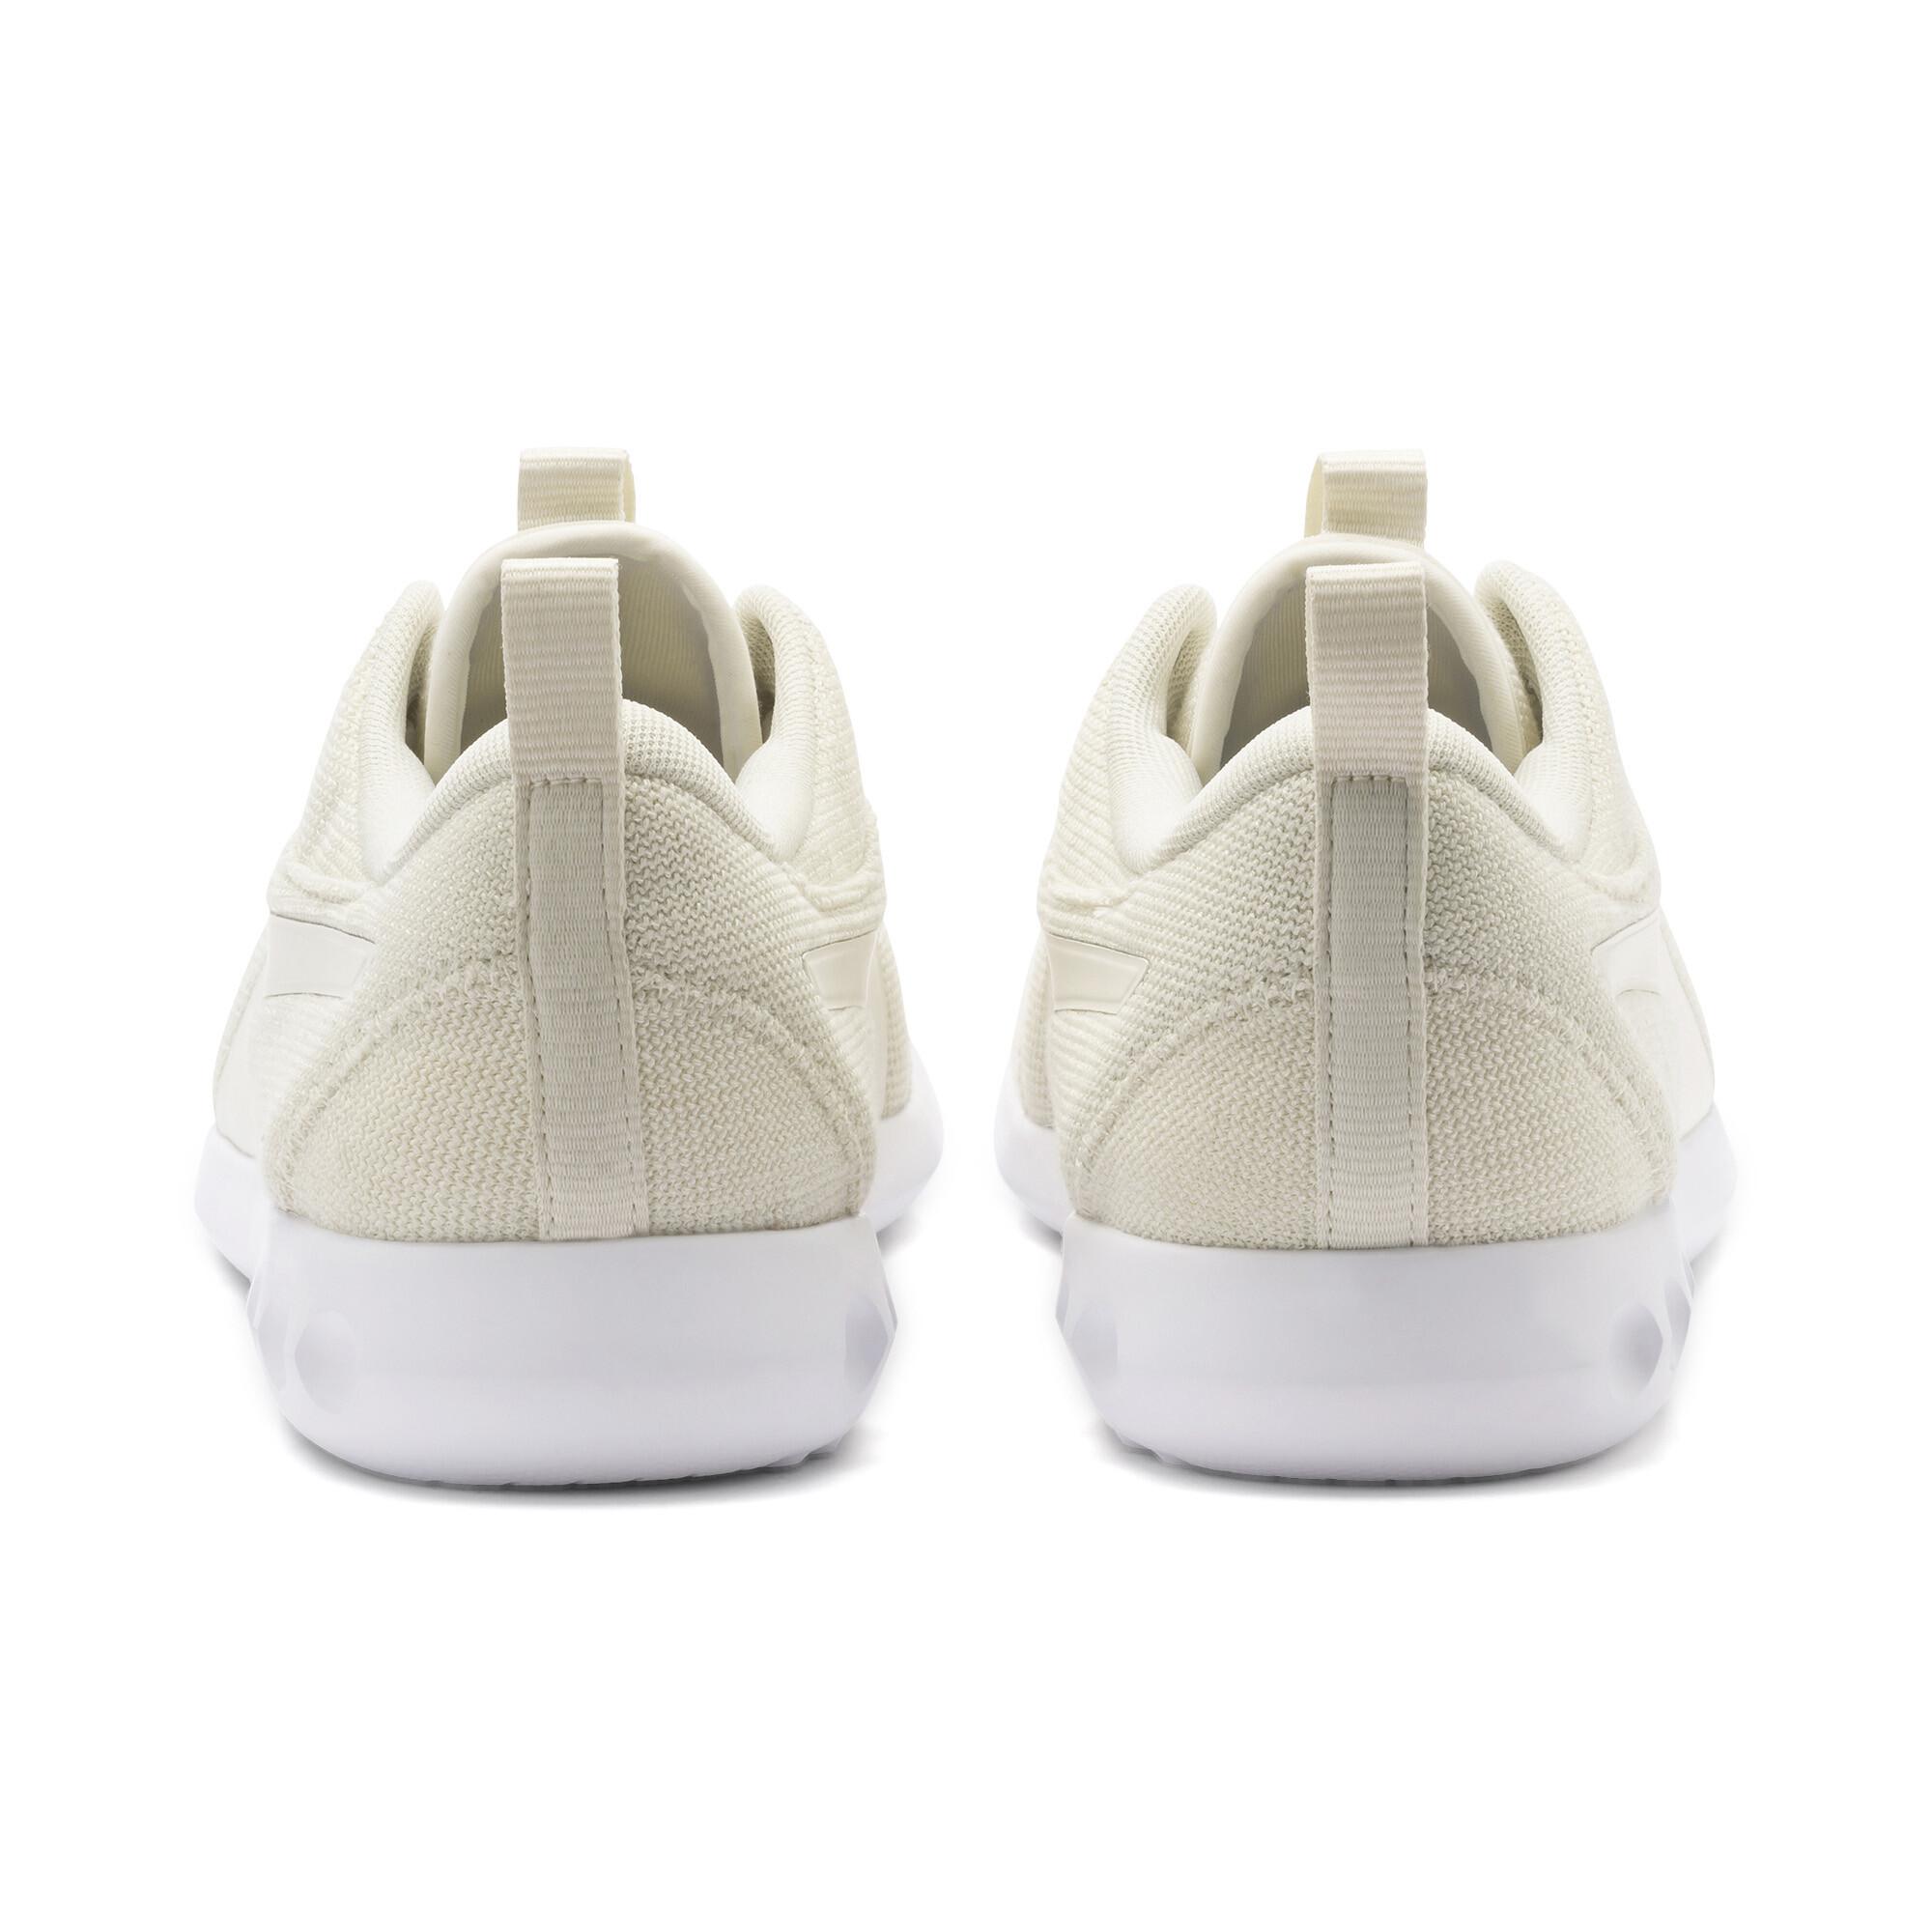 PUMA-Carson-2-Knit-Men-039-s-Training-Shoes-Men-Shoe-Running thumbnail 7